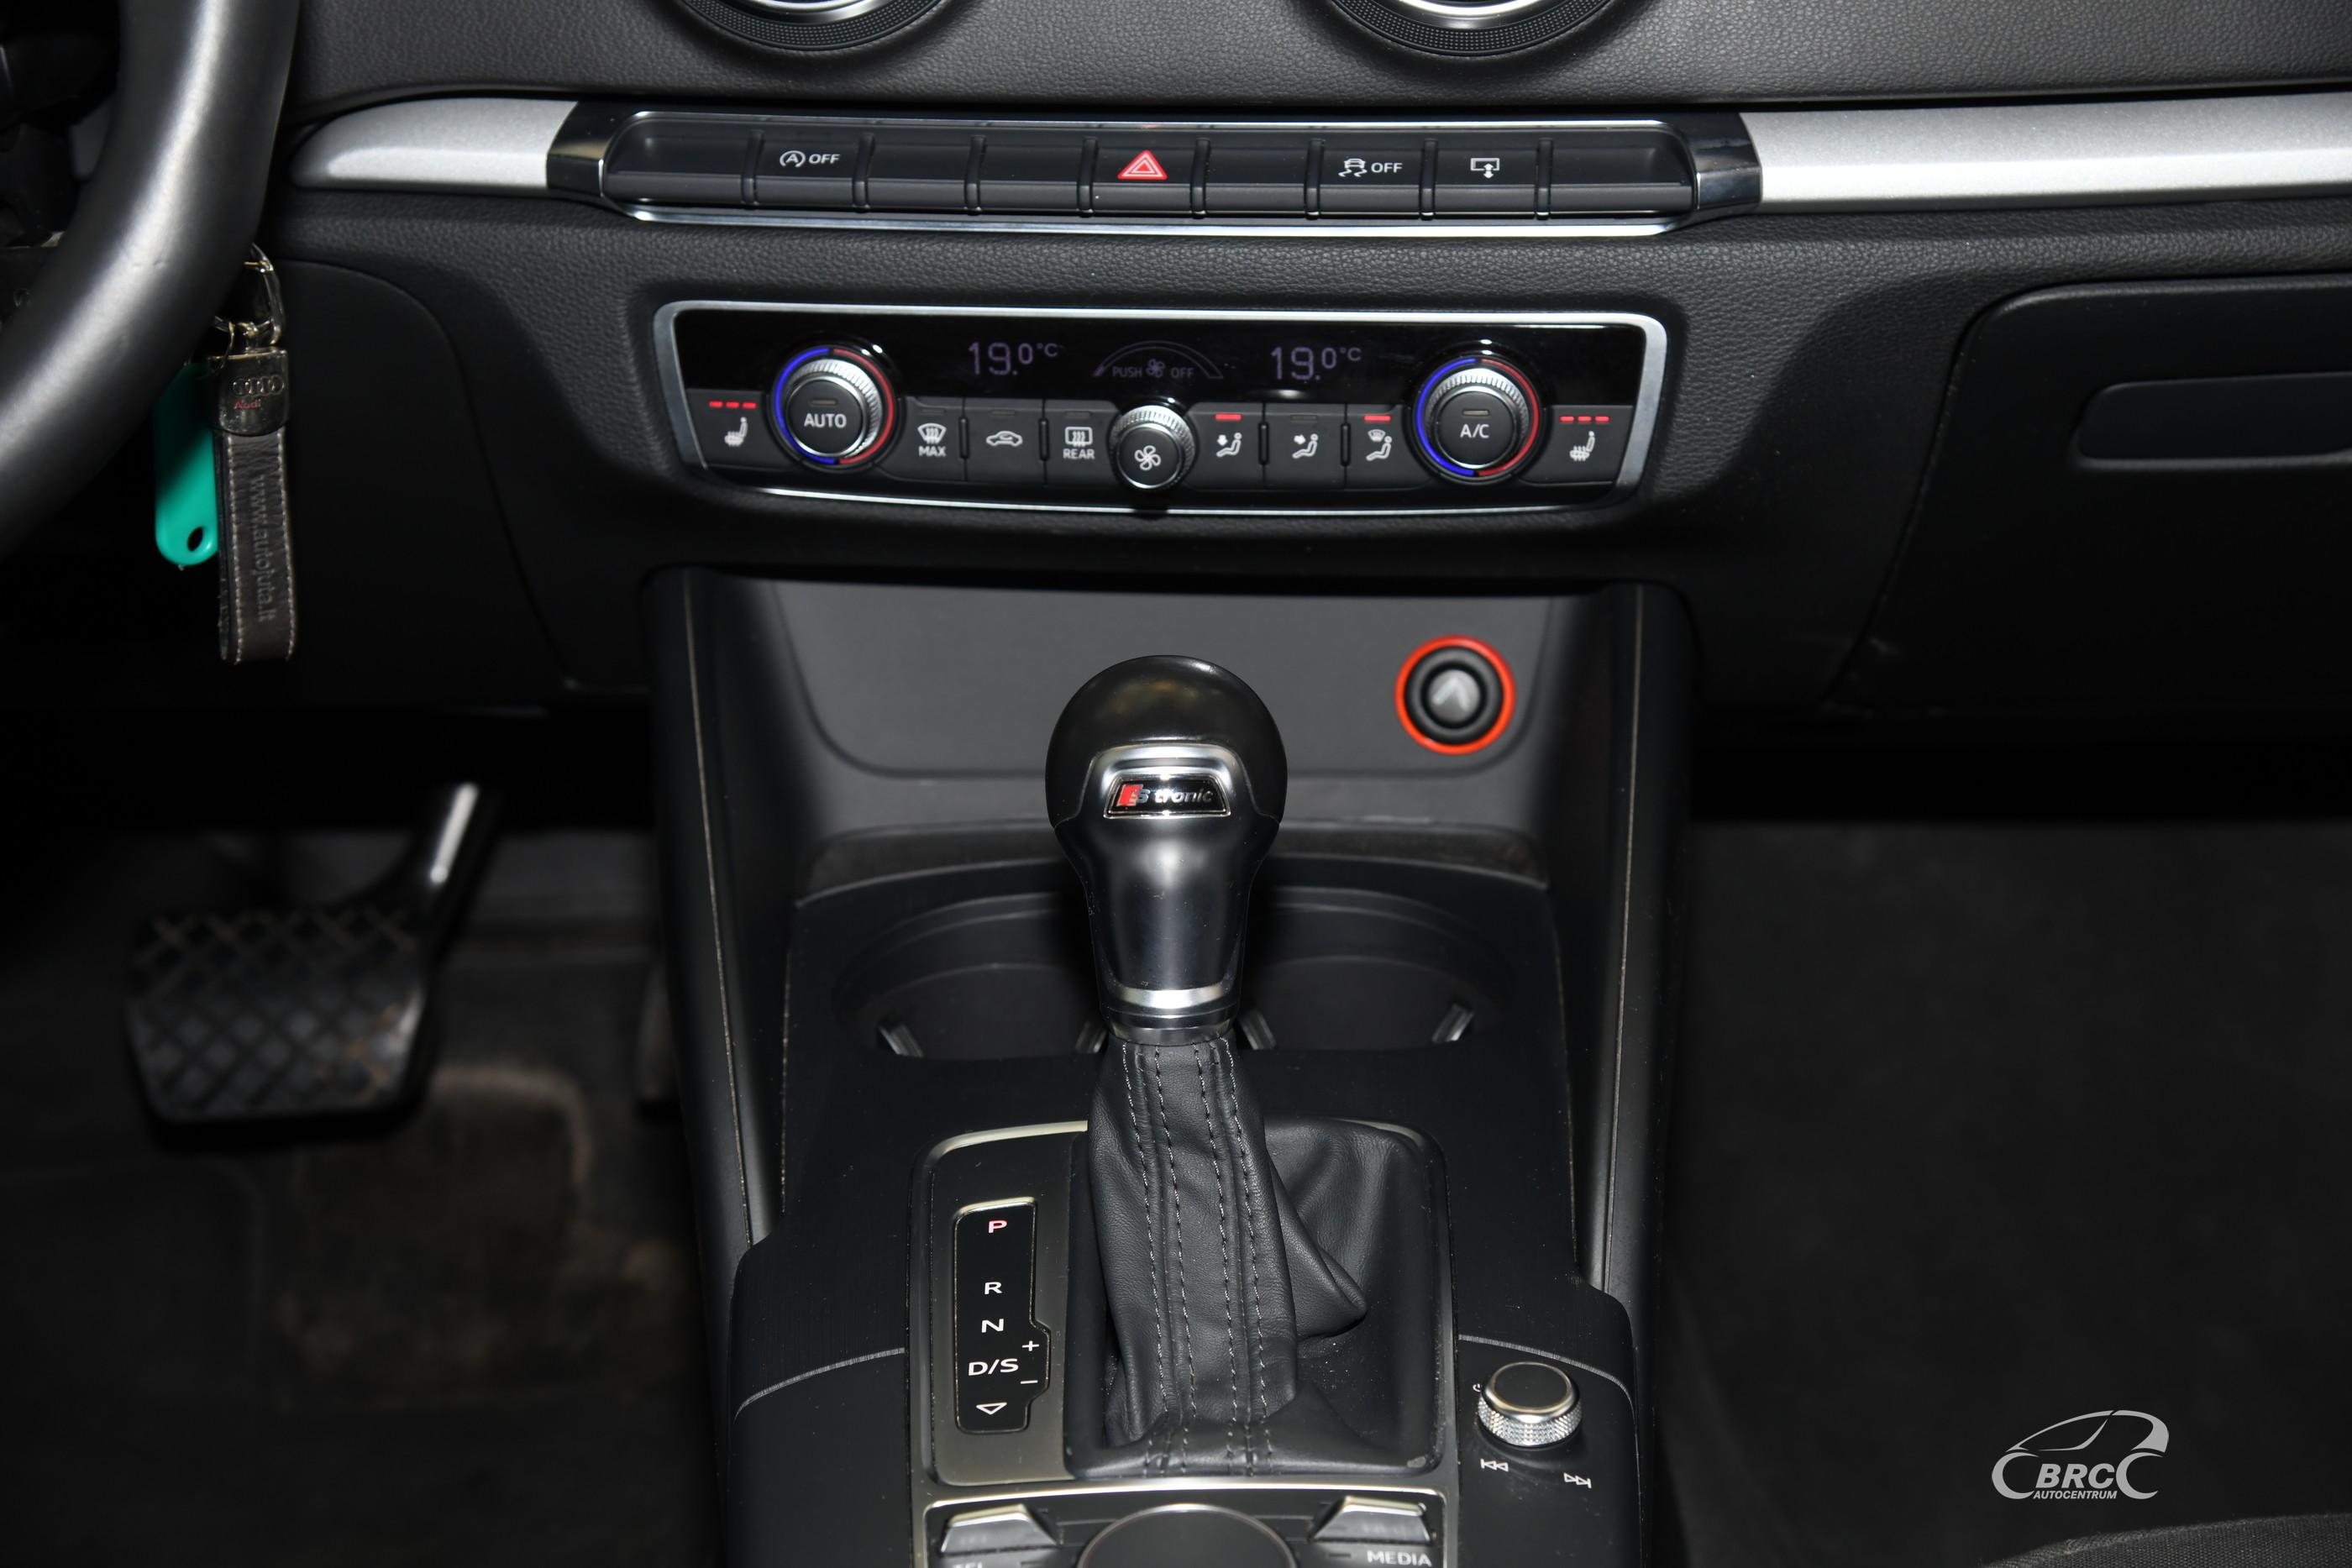 Audi A3 1.6 TDI S-Tronic Automatas